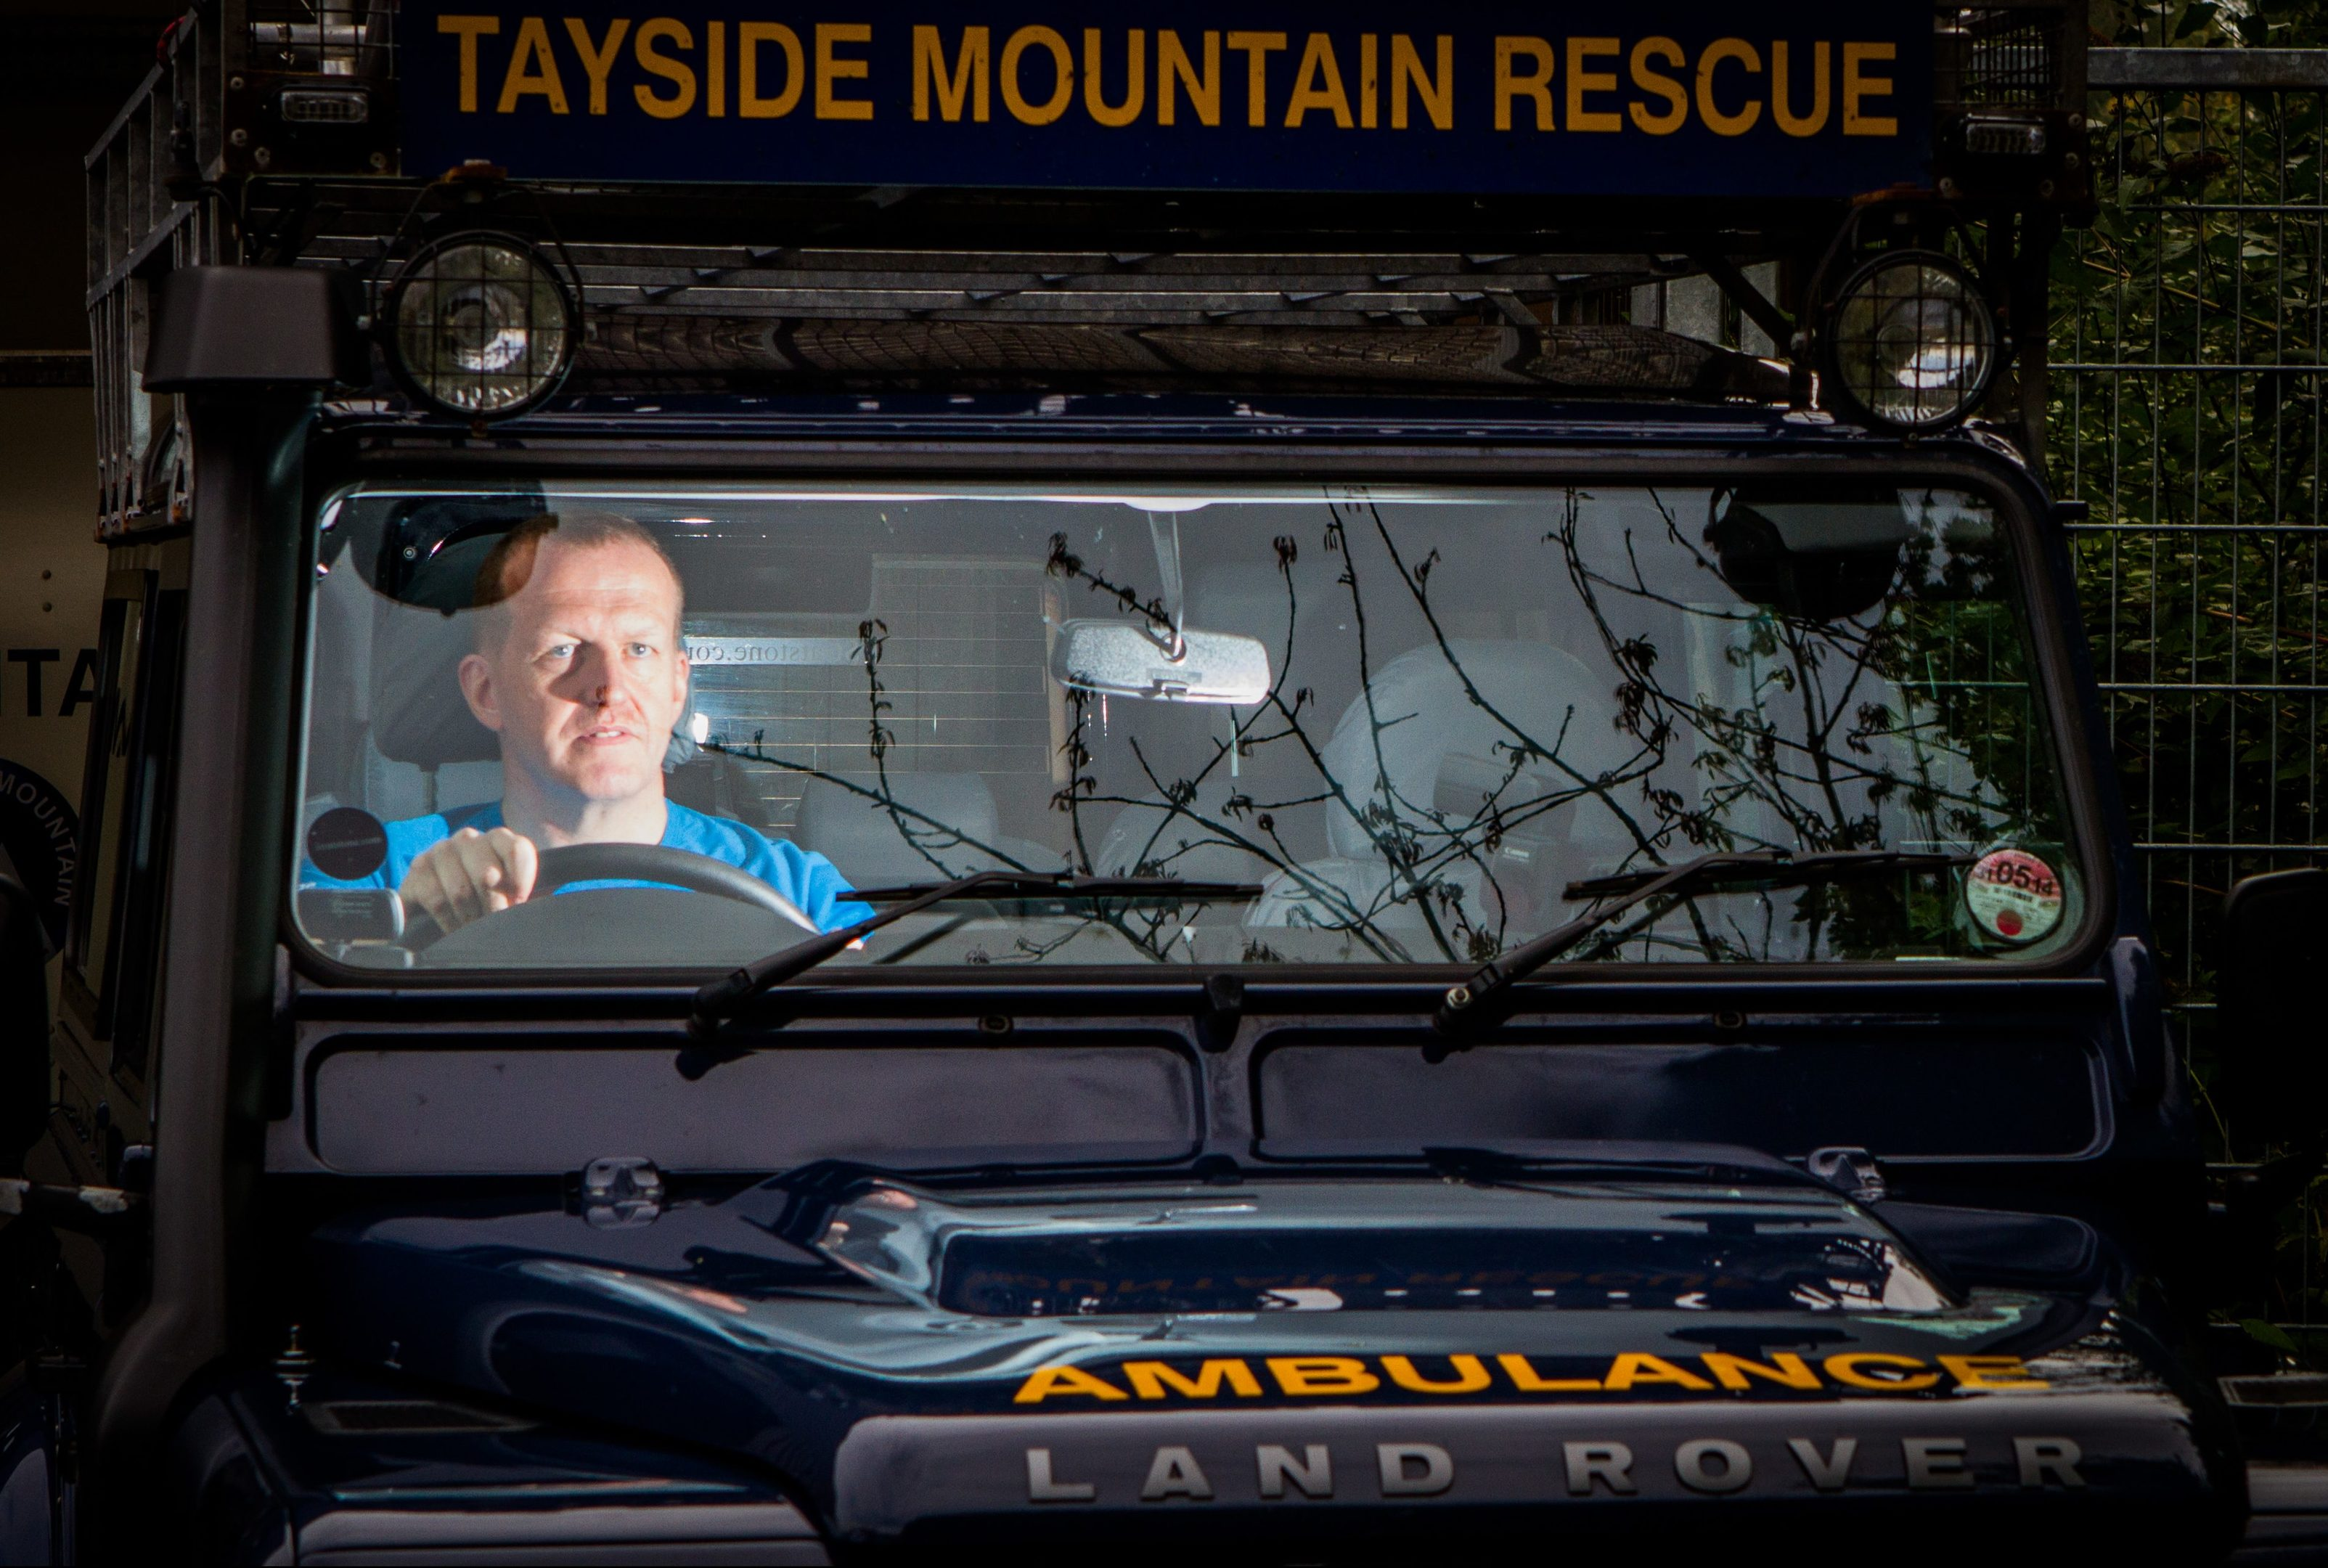 Tayside Mountain Rescue.